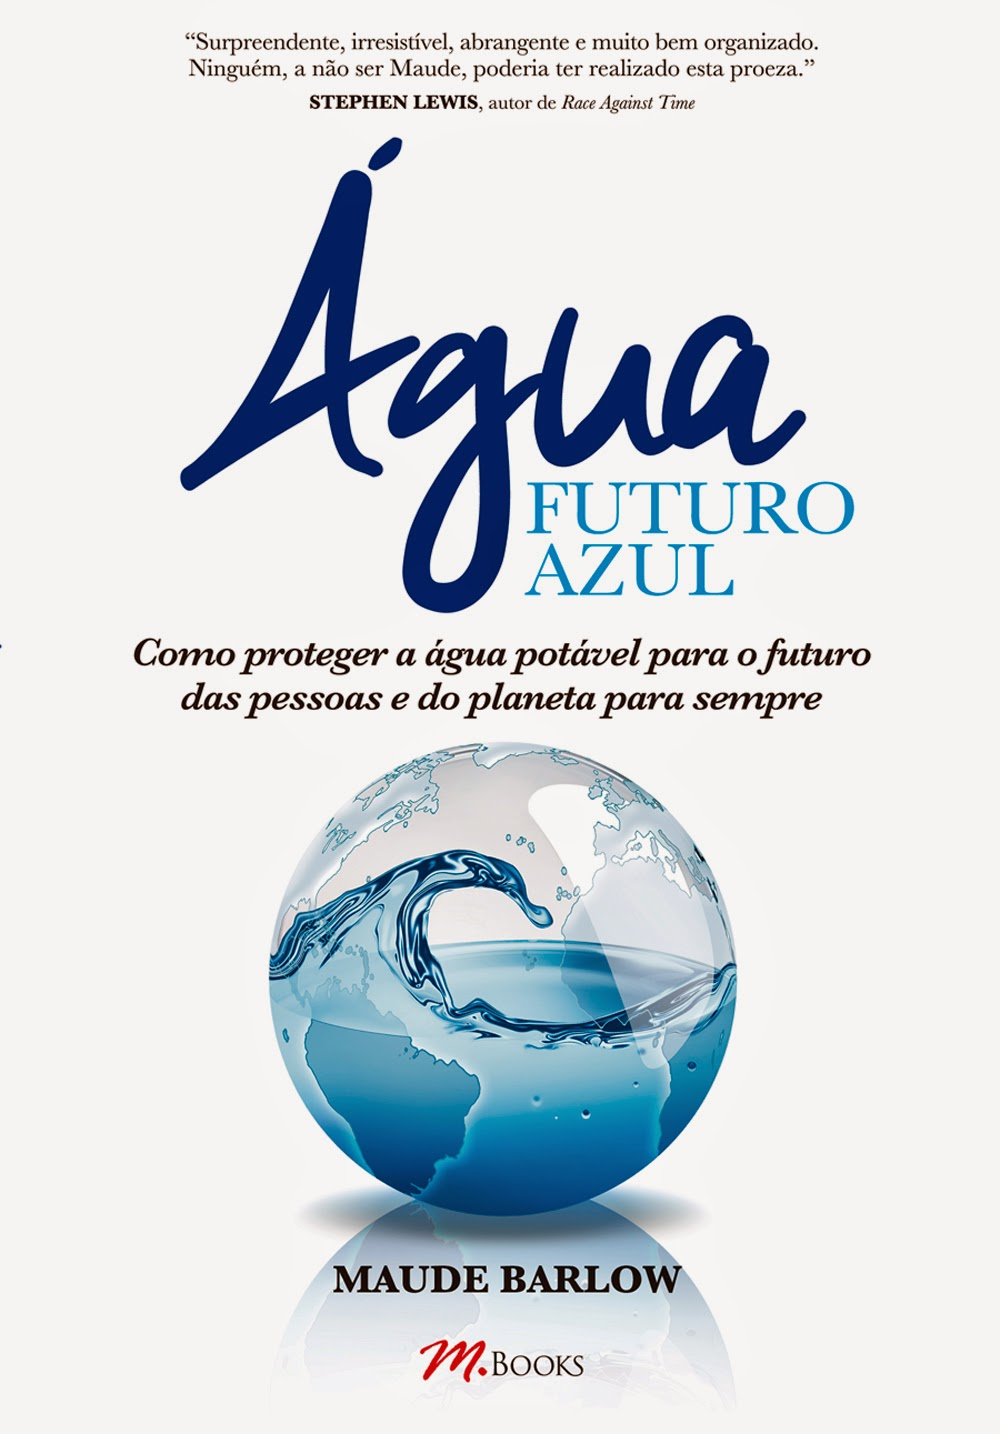 Capa do livro Água - Futuro Azul